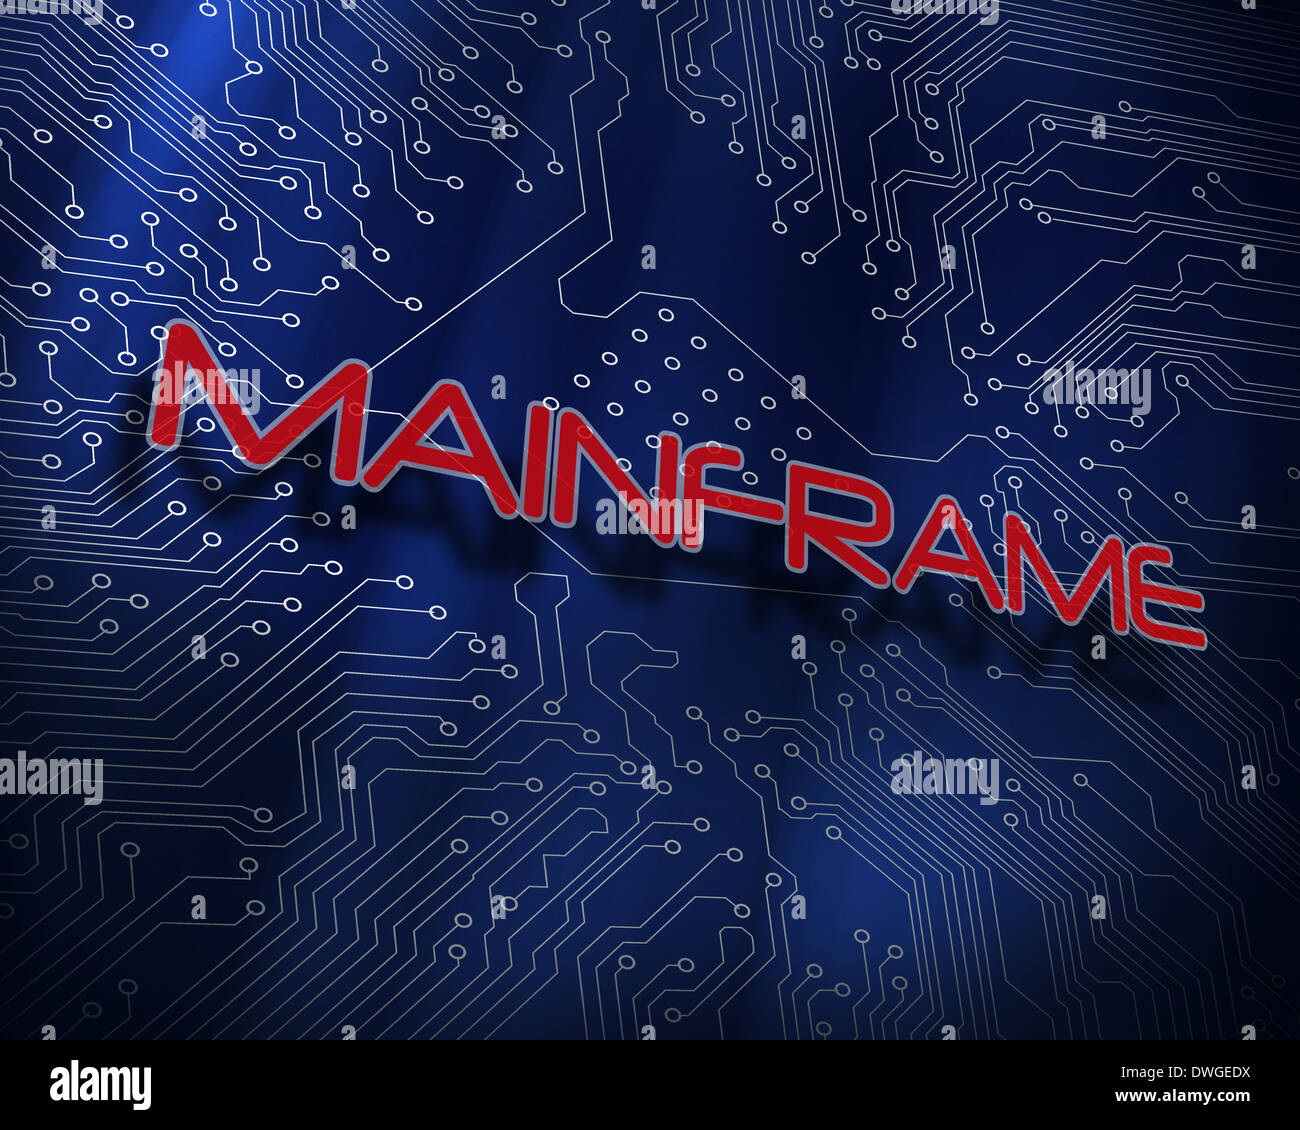 Mainframe against blue technology background - Stock Image